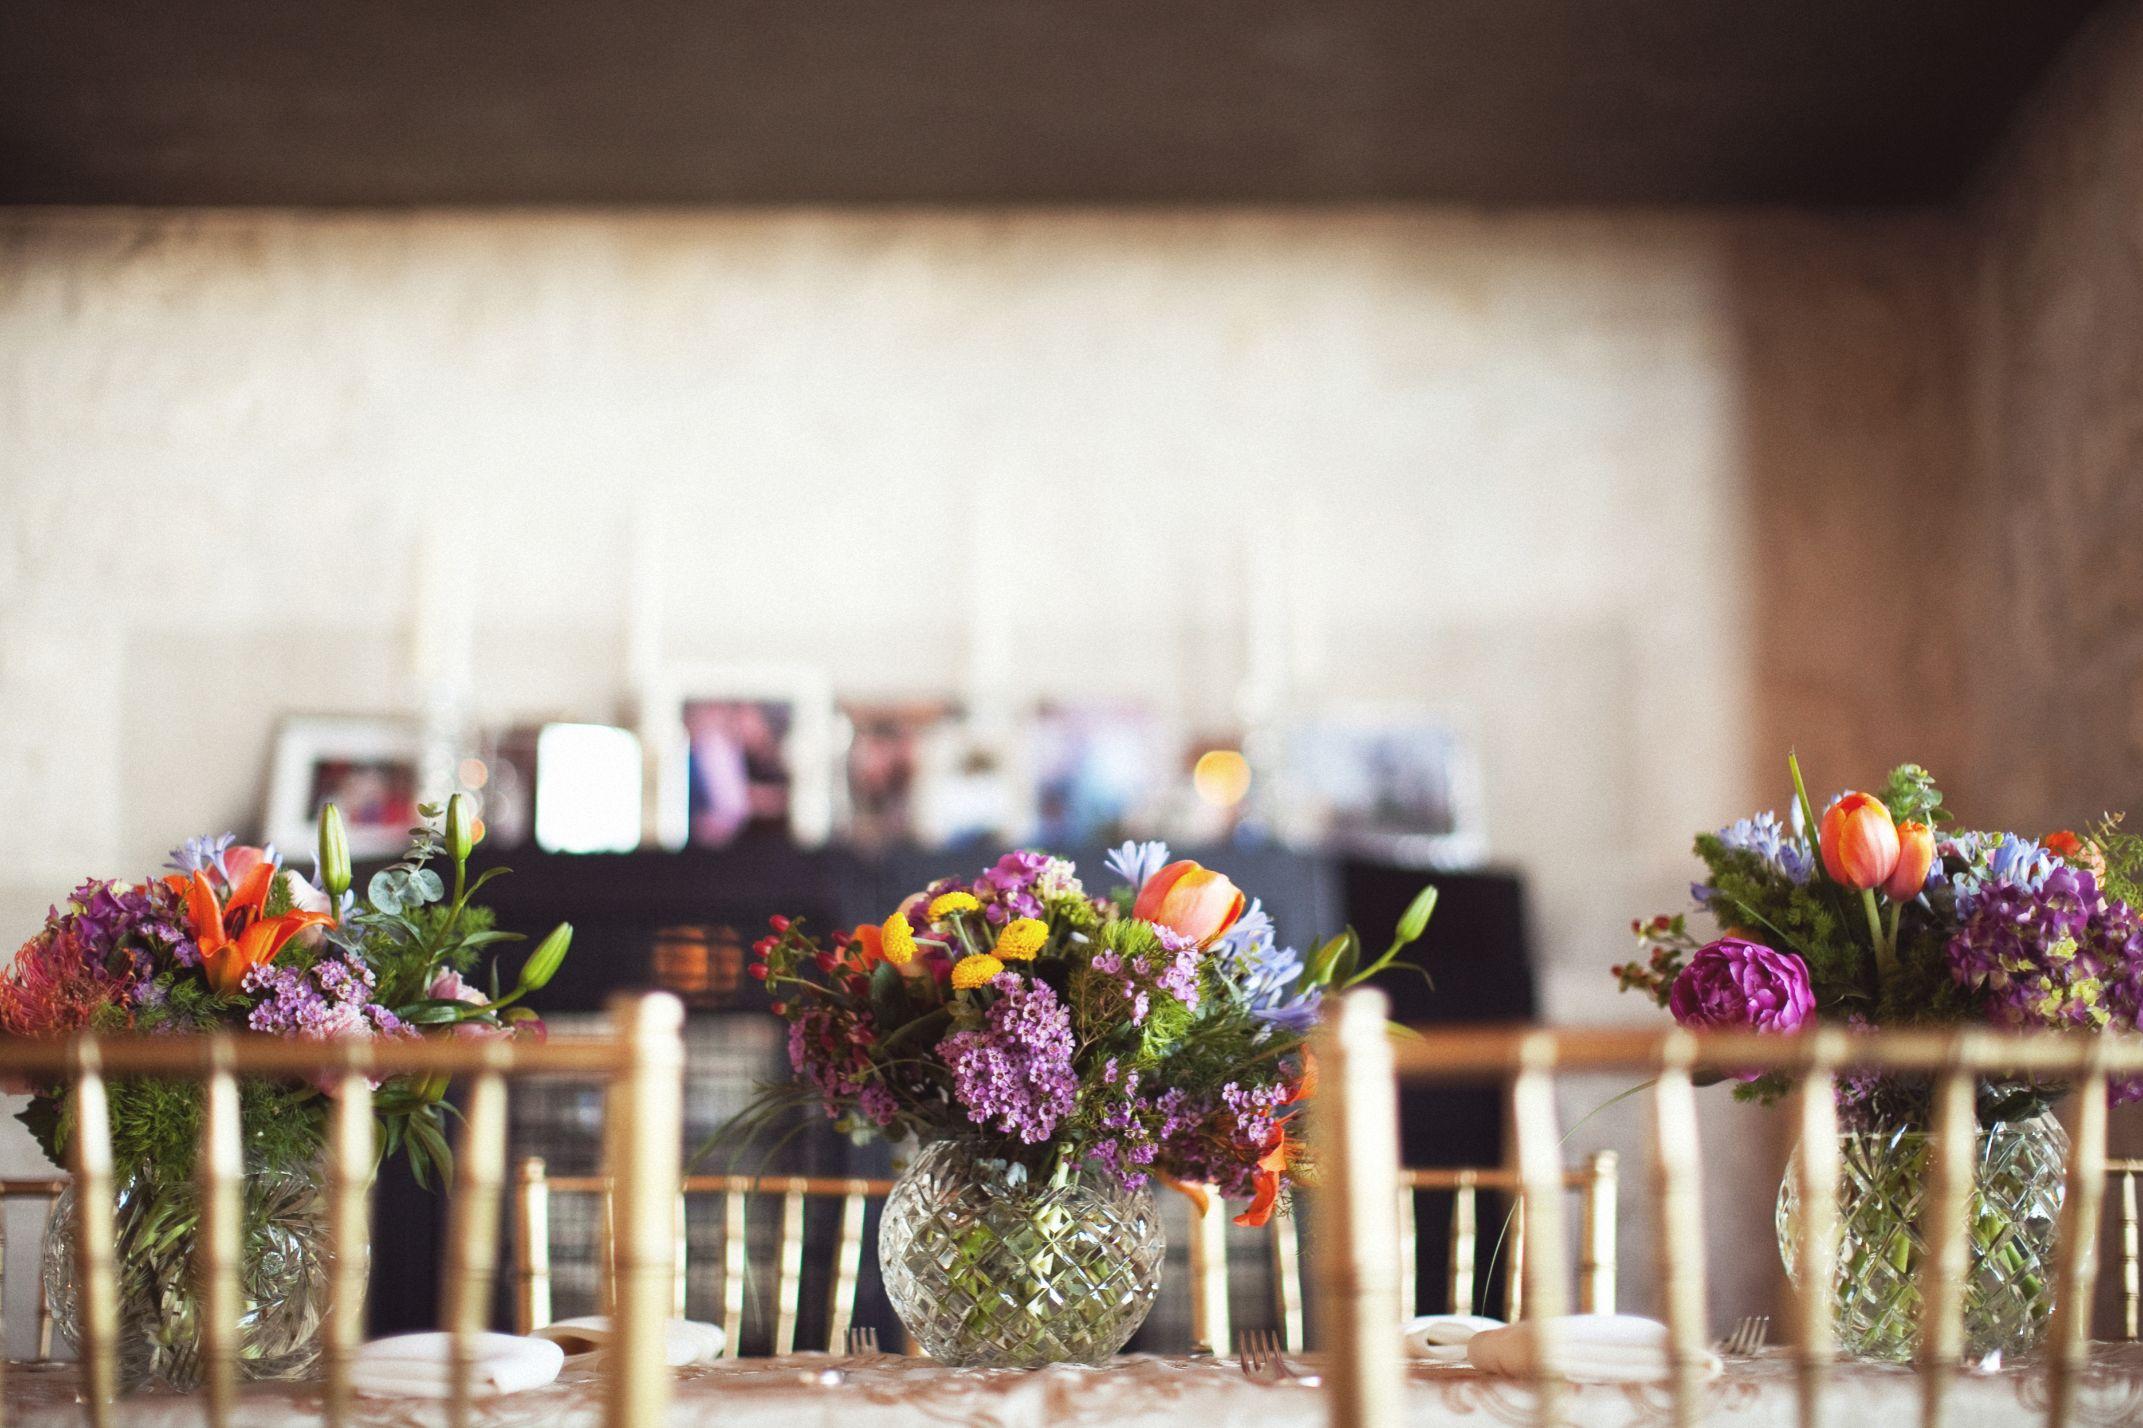 eephoto.katie.tom.wedding-76.jpg